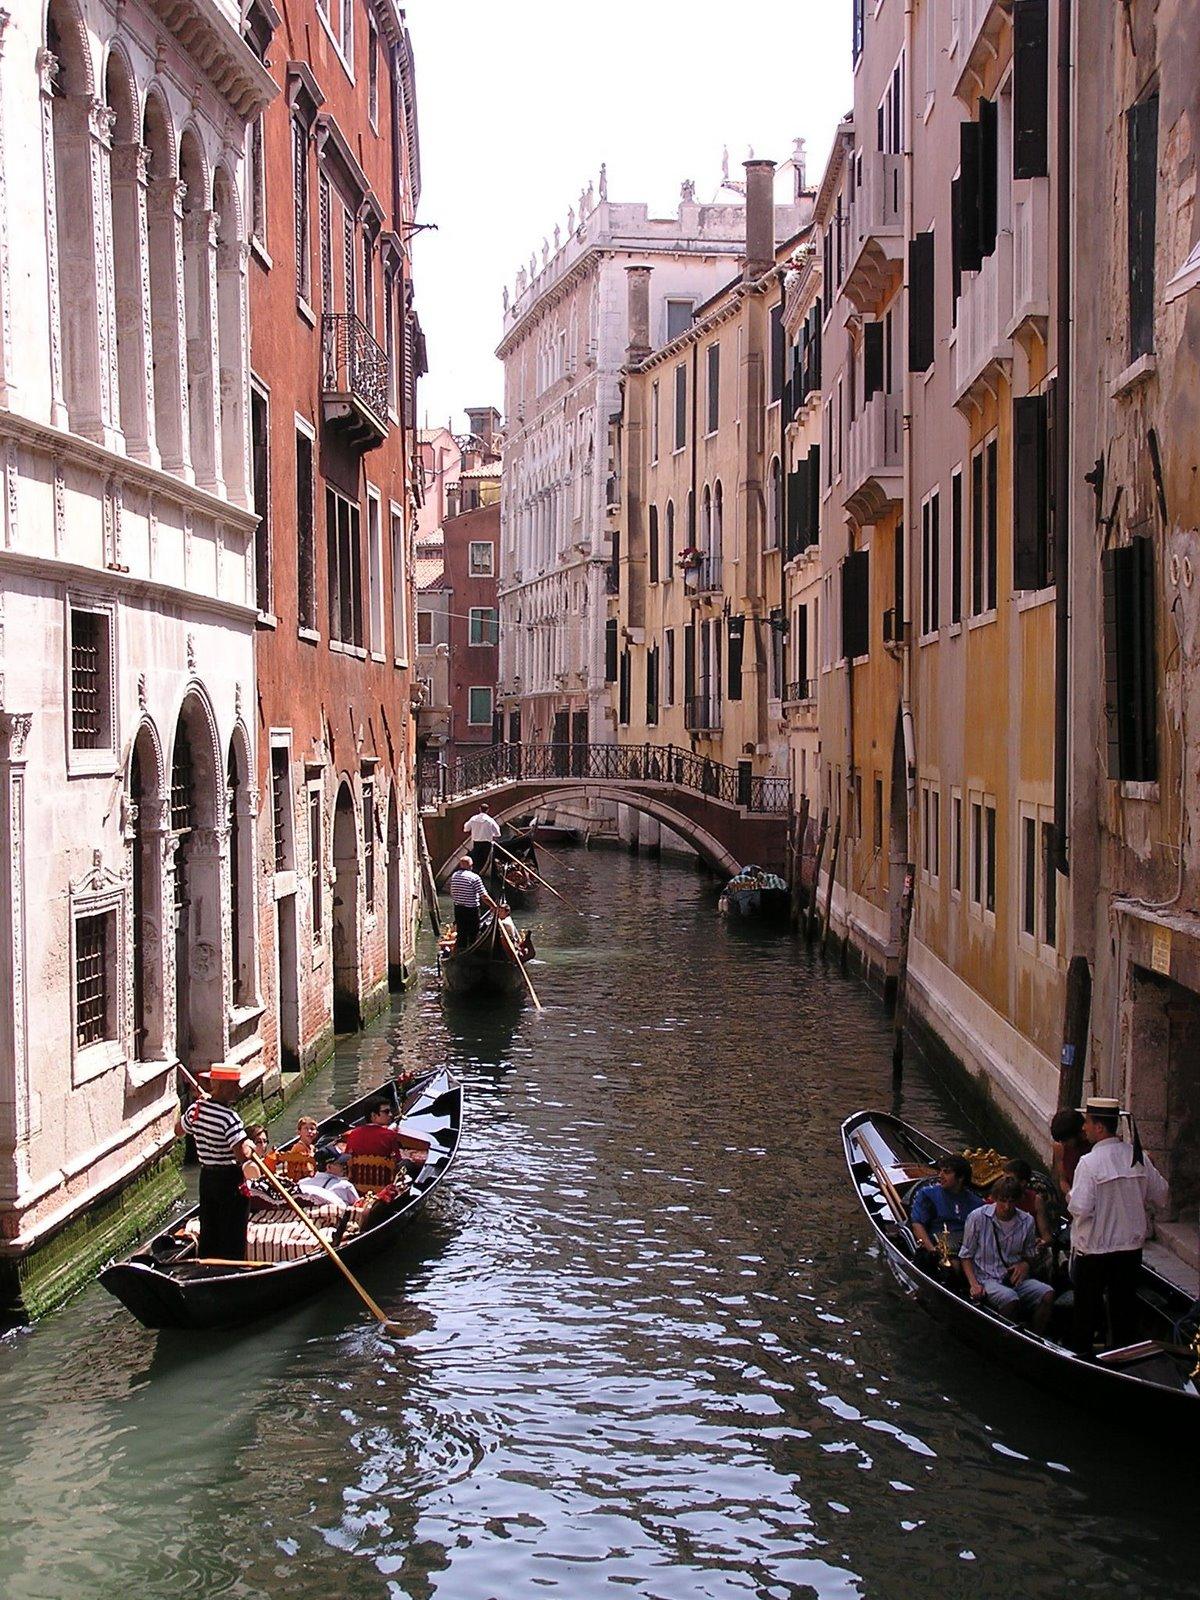 gondolas in Venice, Italy canal